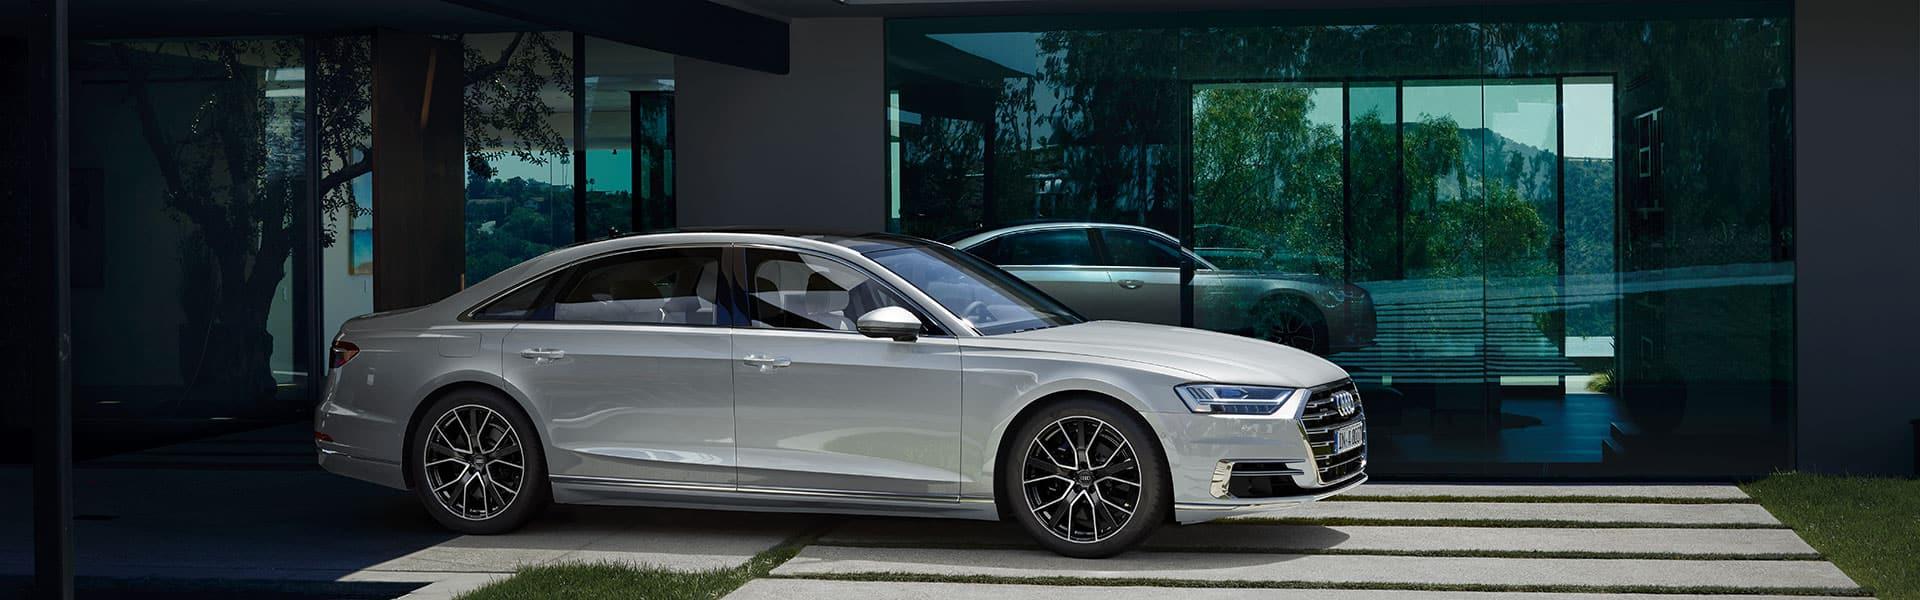 Audi Exclusive Audi Models Audi Qatar - Audi sedan models